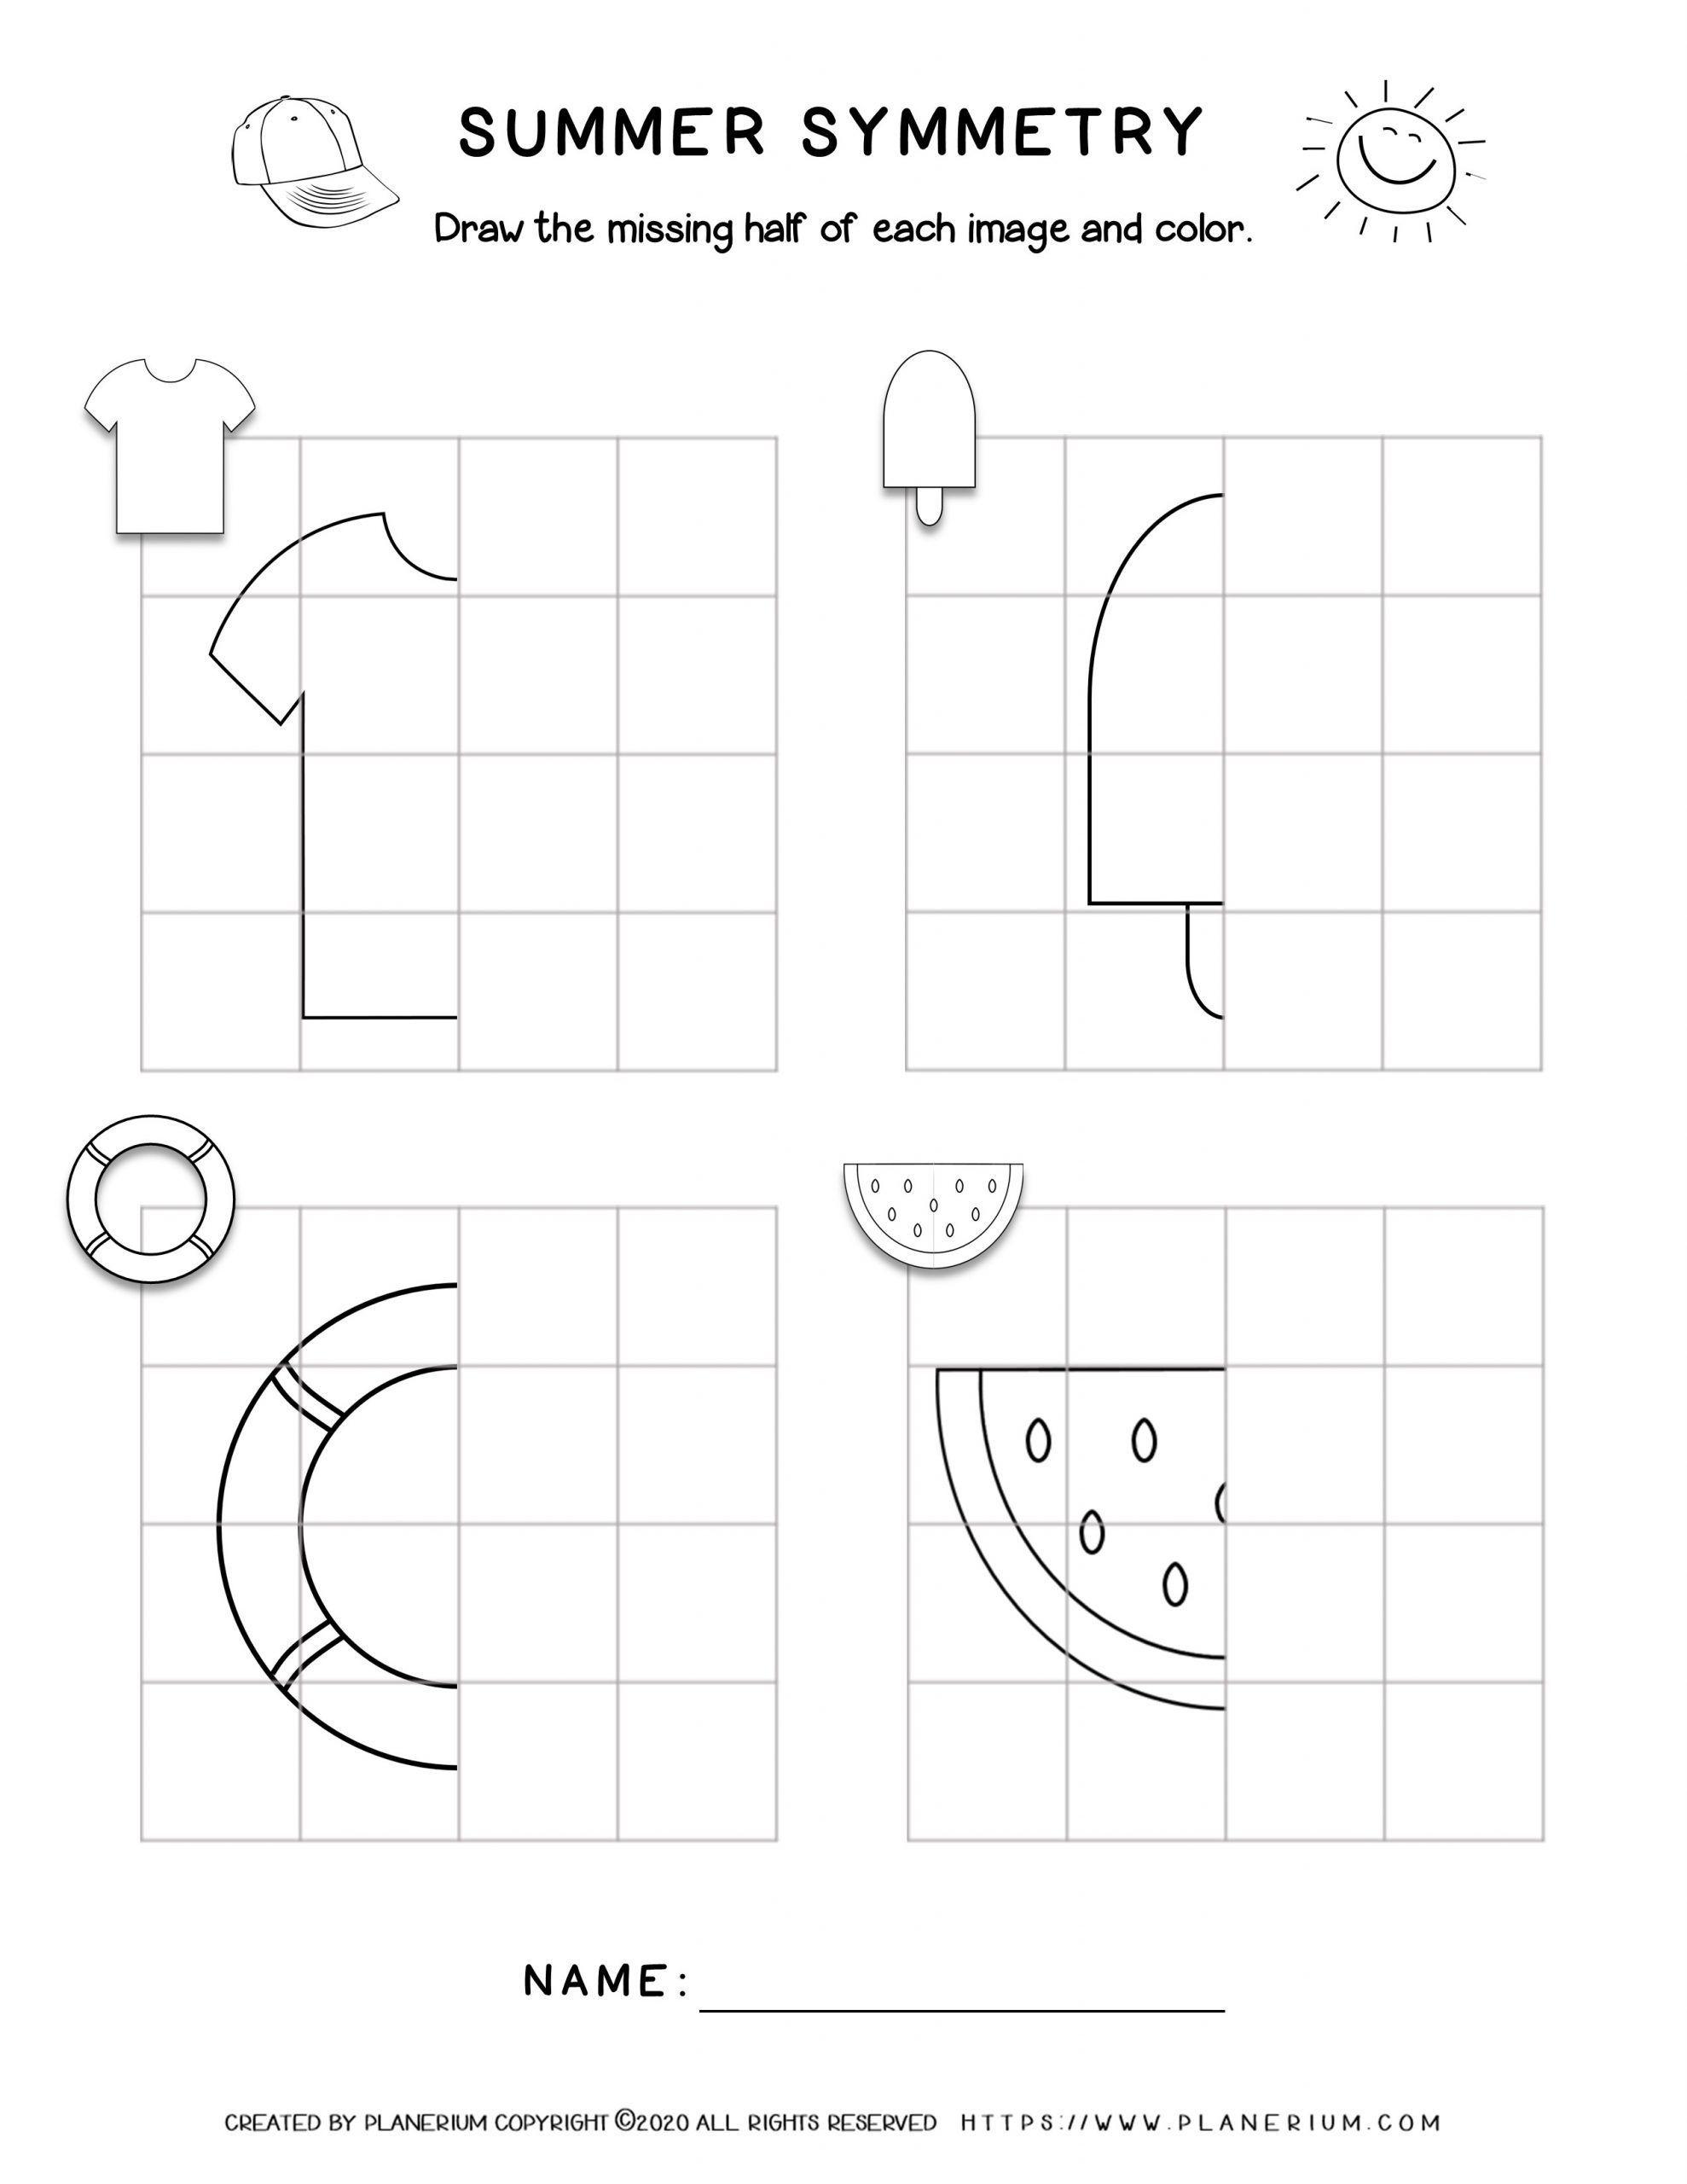 Worksheets2021 Summer Symmetry Drawing Symmetry Worksheets Symmetry Activities Symmetry